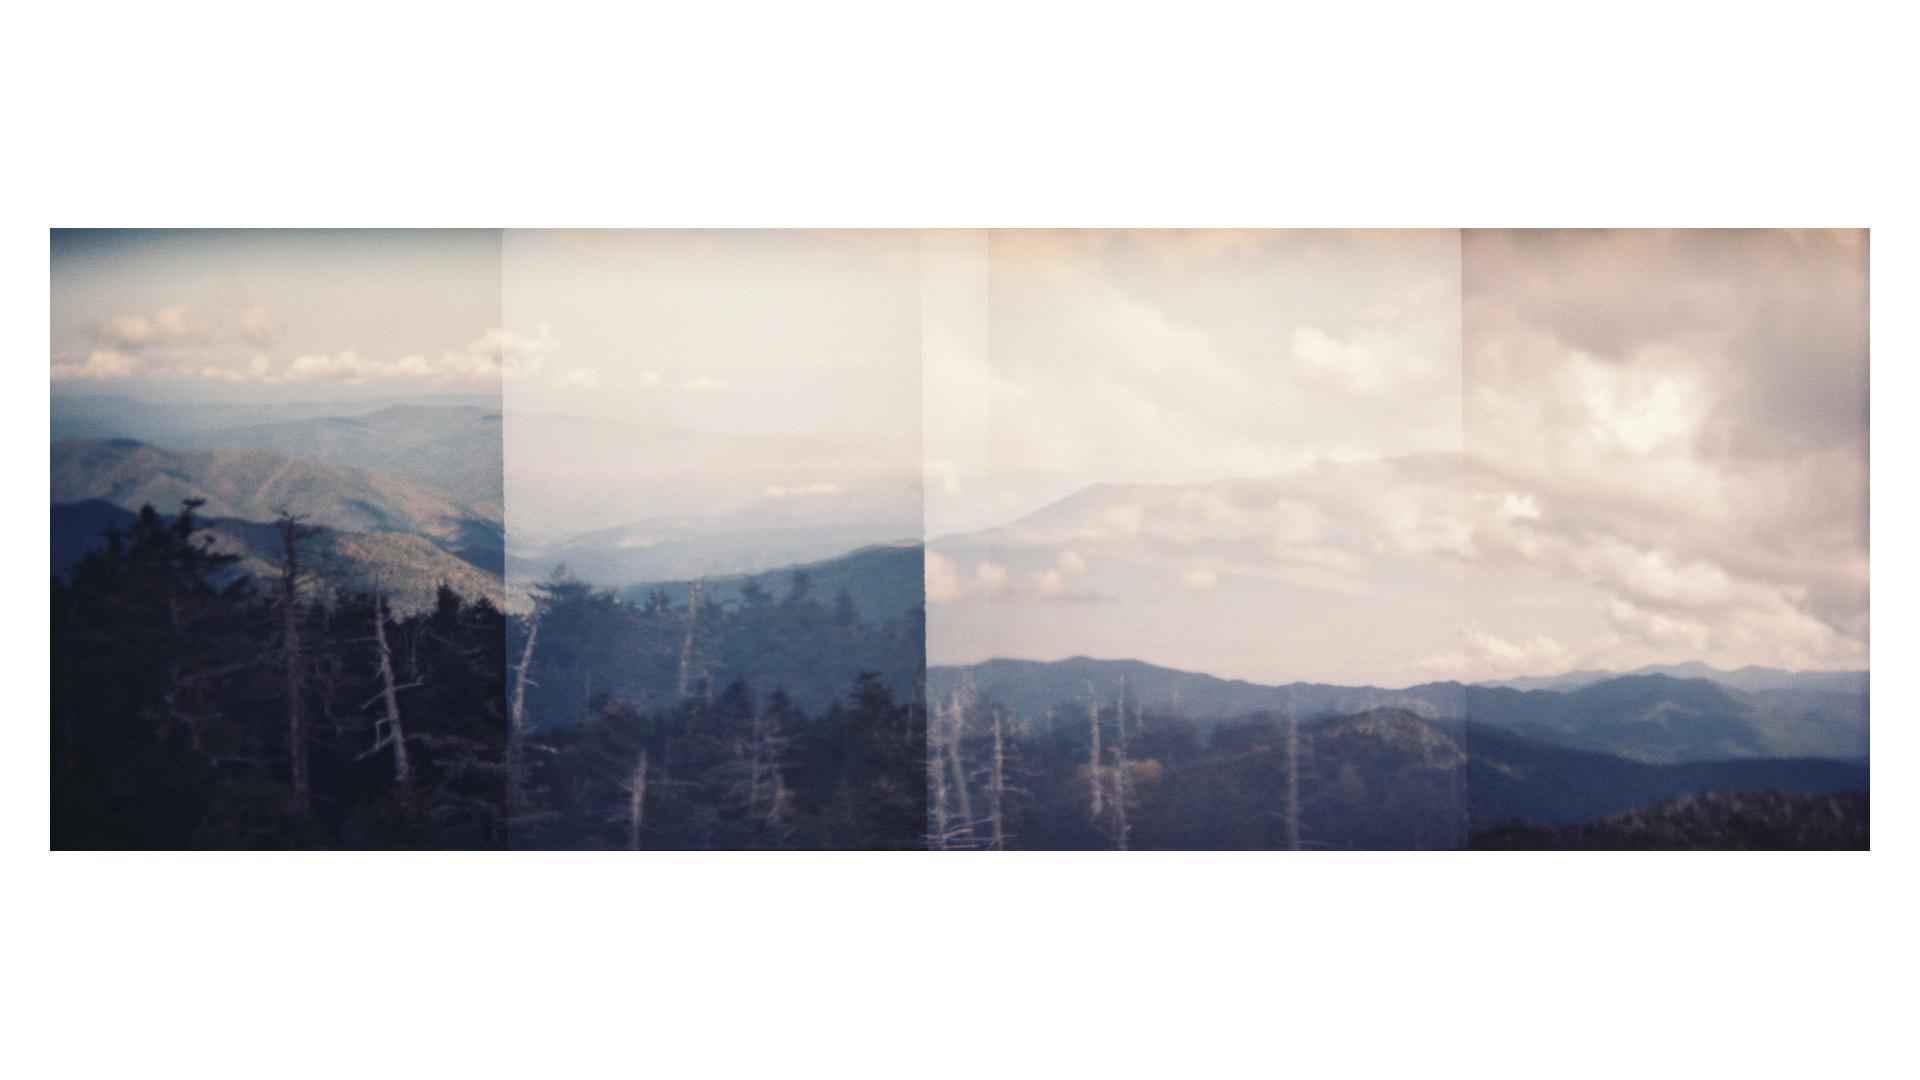 overlapping exposures of the blue ridge mountains // (c) jocelynmathewes.com